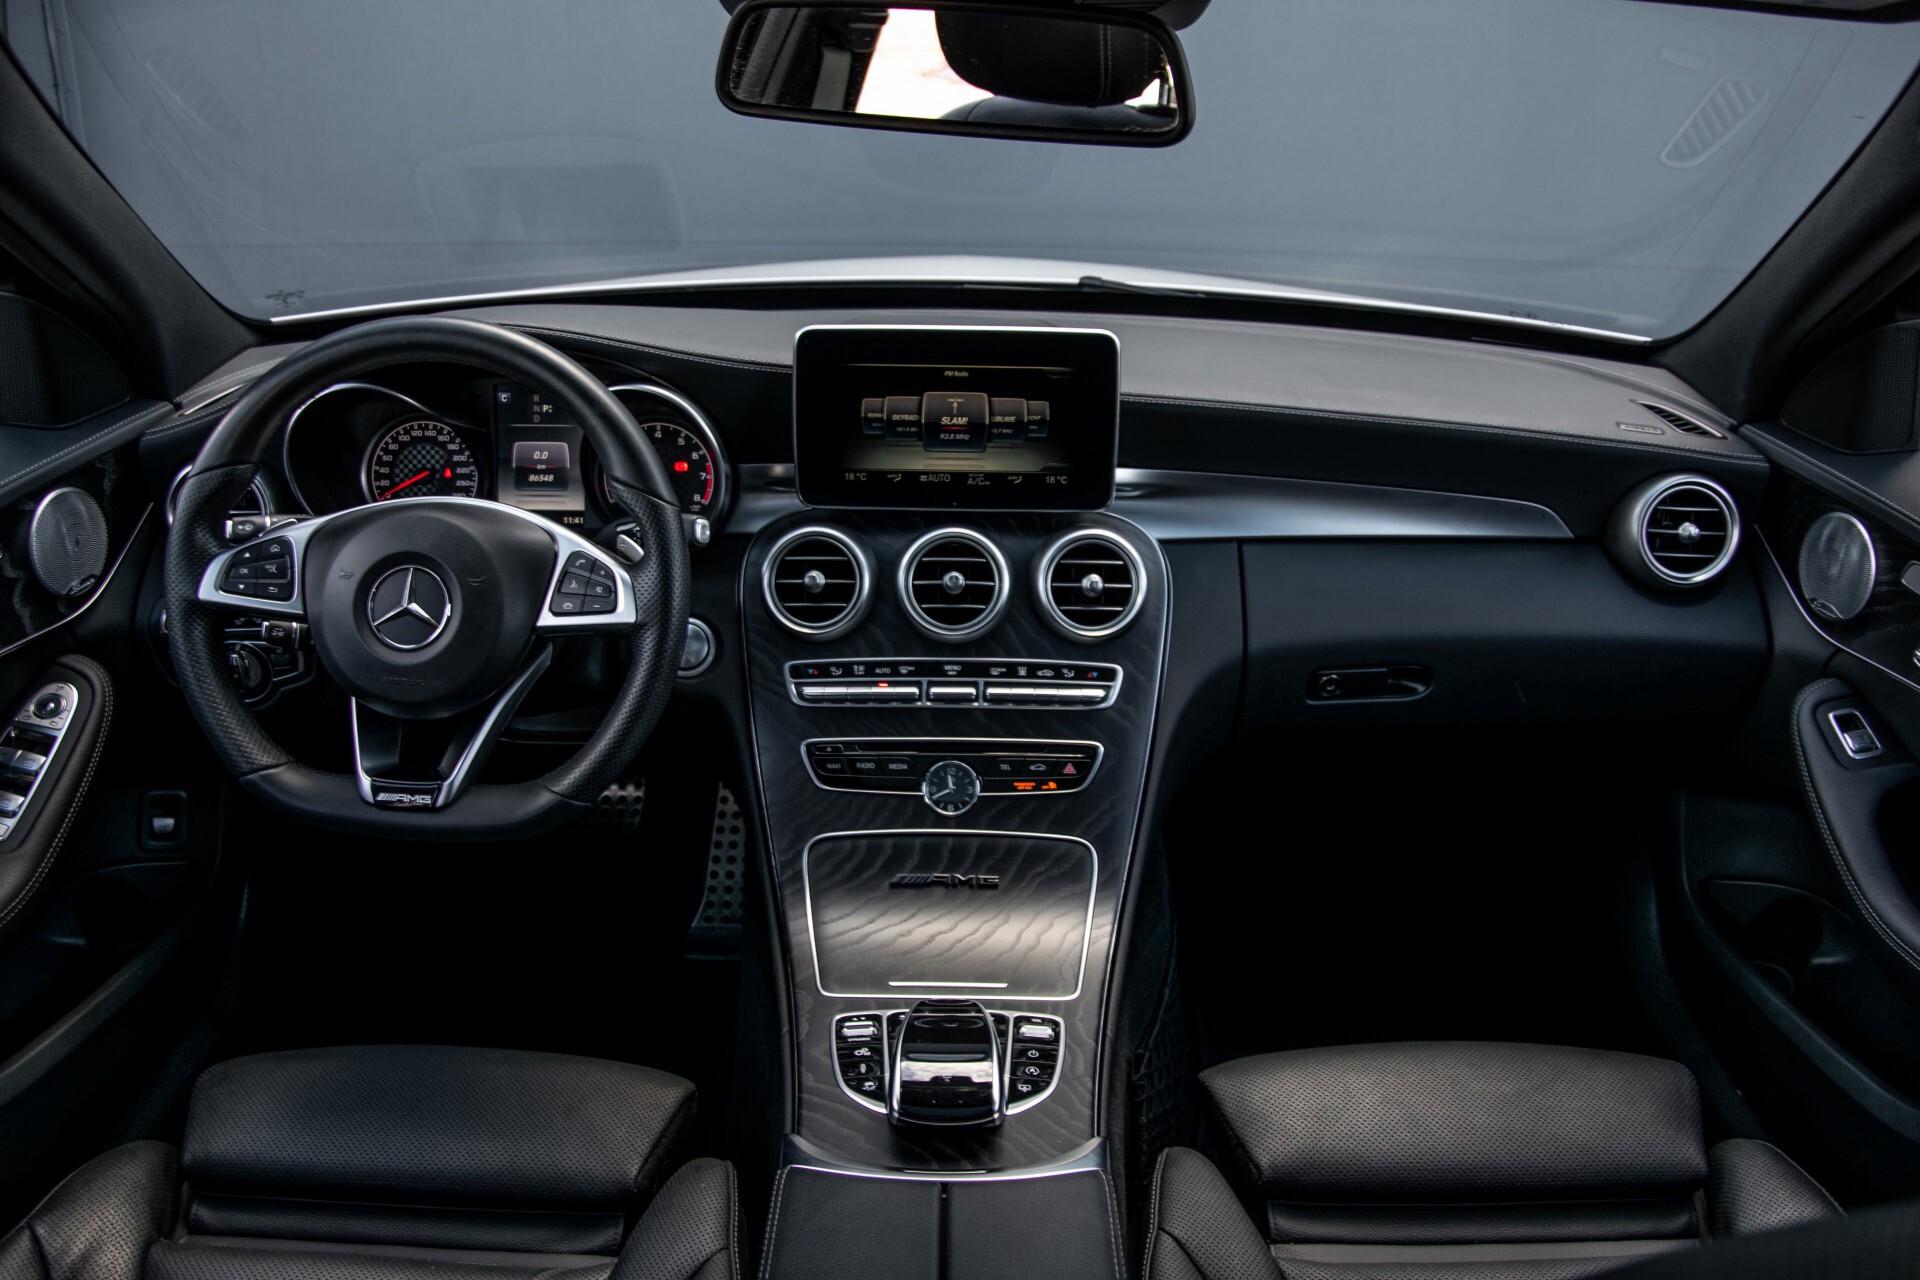 Mercedes-Benz C-Klasse 450/43 AMG 4-M Distronic/Standkachel/Panorama/Keyless/Harman-Kardon/Stoelkoeling Aut7 Foto 8